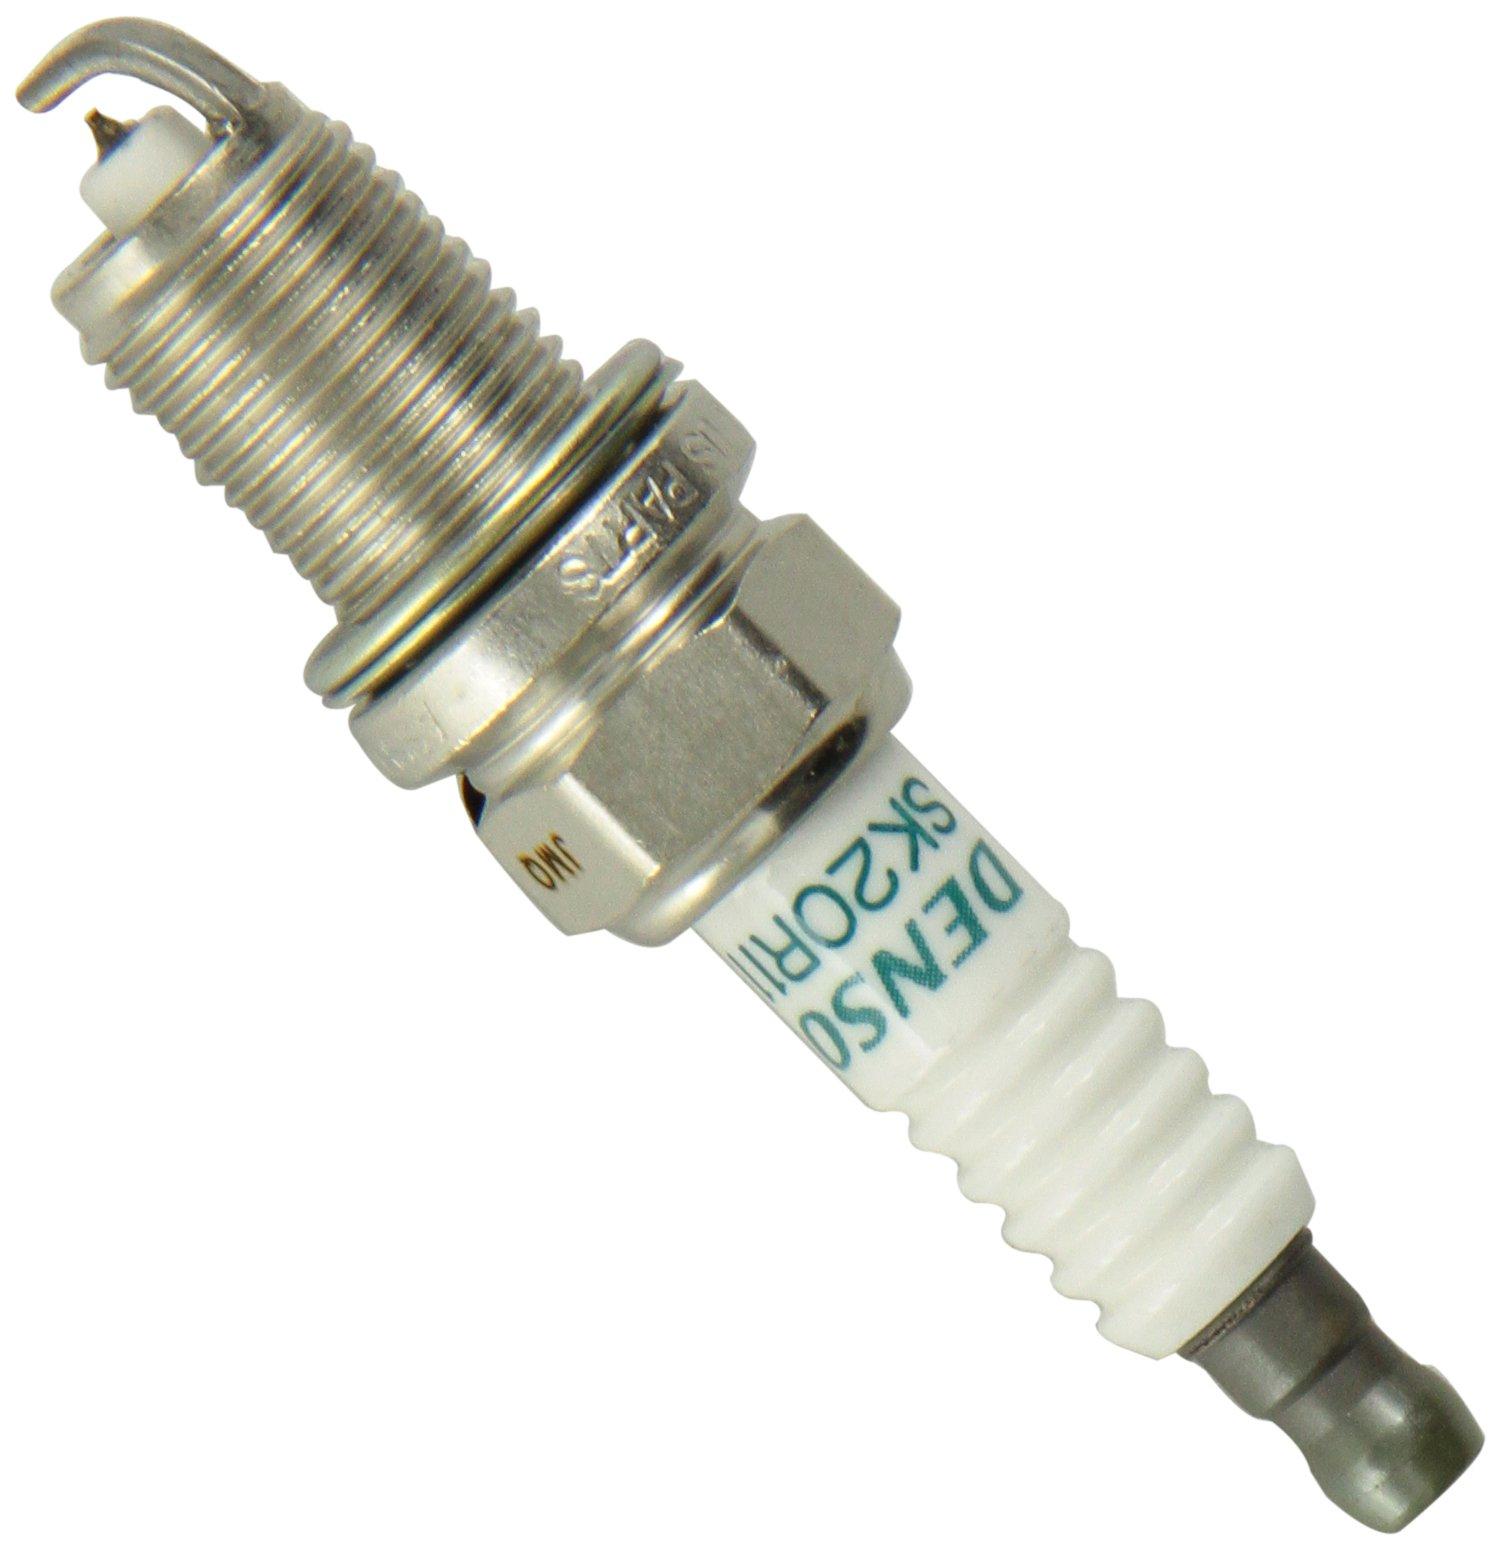 Denso (3297) SK20R11 Iridium Spark Plug, Pack of 1